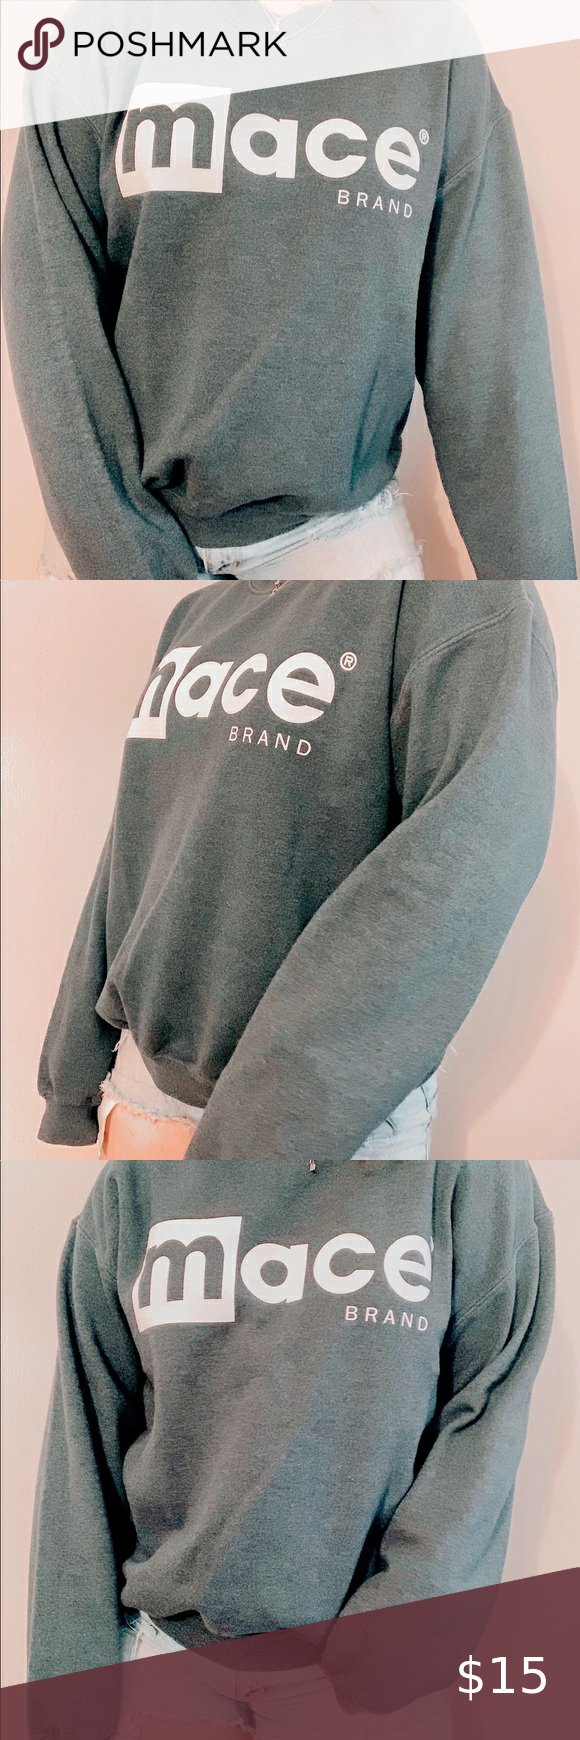 Mace Crewneck Sweatshirt Brand Gildan X Mace Size Medium Slightly Oversized Coloe Gray Swipe To End In 2020 Sweatshirts Crew Neck Sweatshirt Branded Sweatshirts [ 1740 x 580 Pixel ]